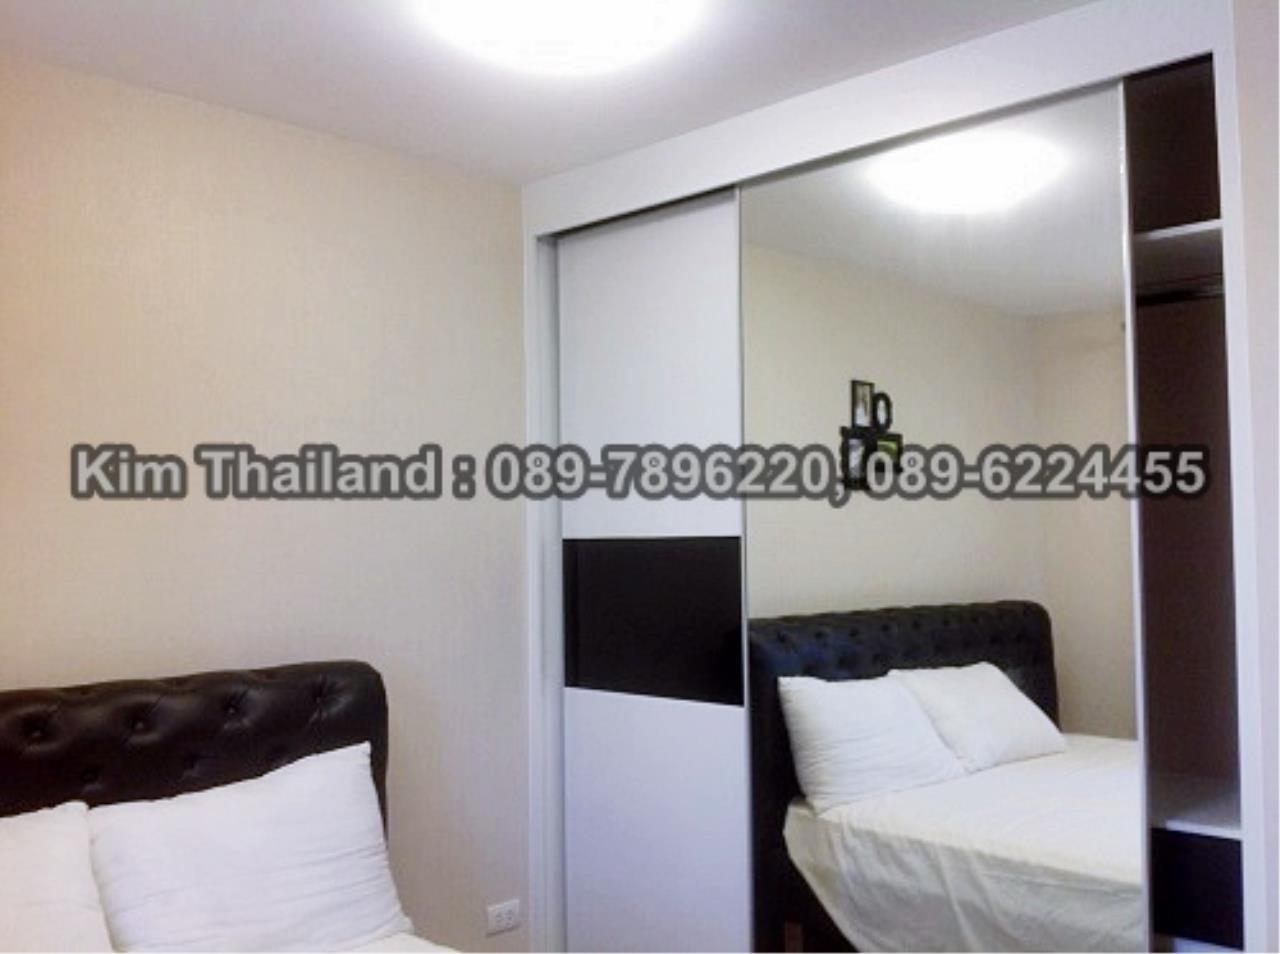 BKKcondorental Agency's For rent, Condo Belle Grand Rama 9.  Building C2, 1Xth floor, Area 48 sq.m.  3